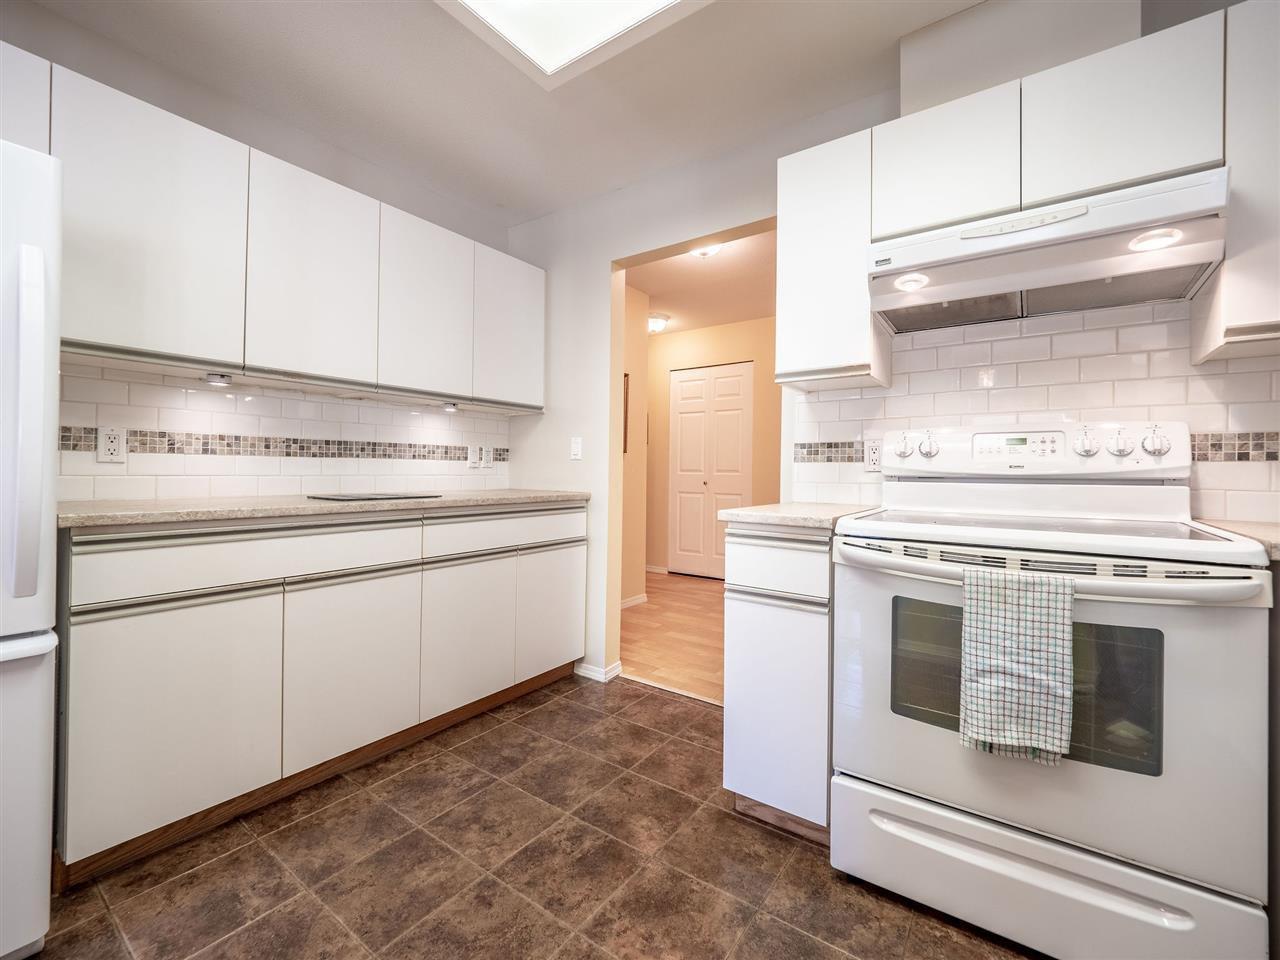 "Photo 8: Photos: 105 5768 MARINE Way in Sechelt: Sechelt District Condo for sale in ""Cypress Ridge"" (Sunshine Coast)  : MLS®# R2446337"